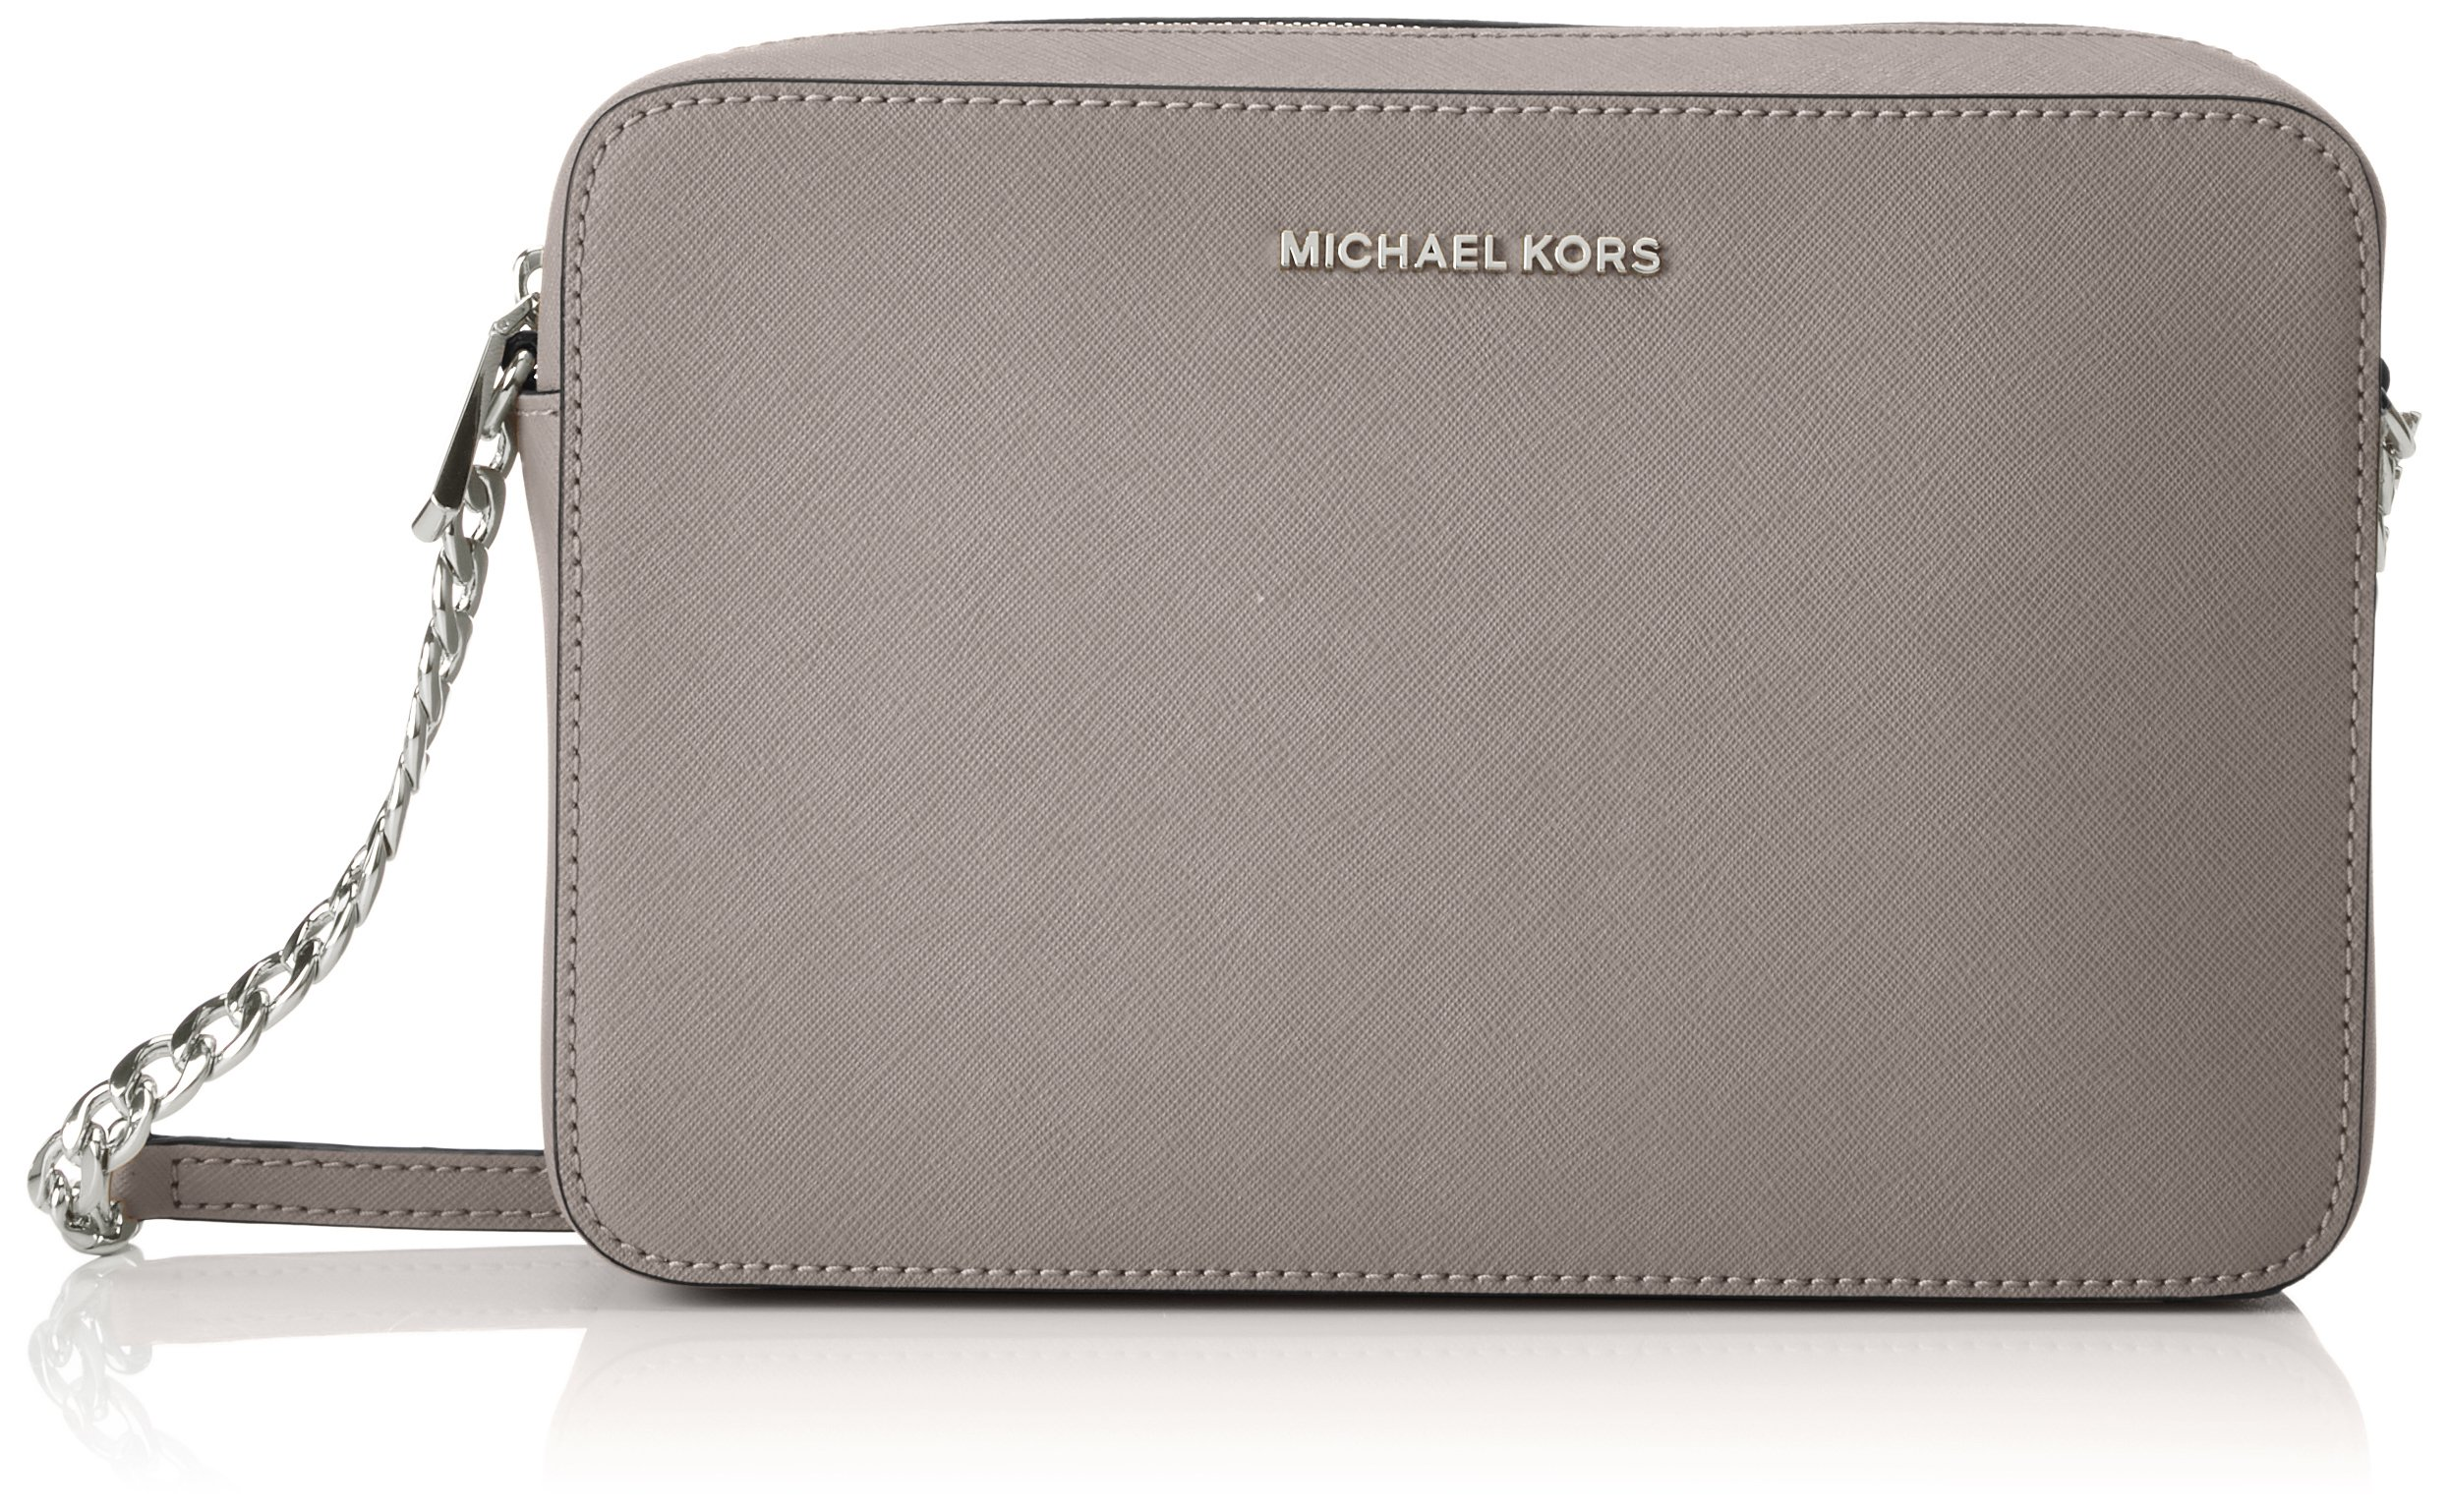 Michael Kors Jet Set Travel Large Crossbody Handbag - Pearl Grey